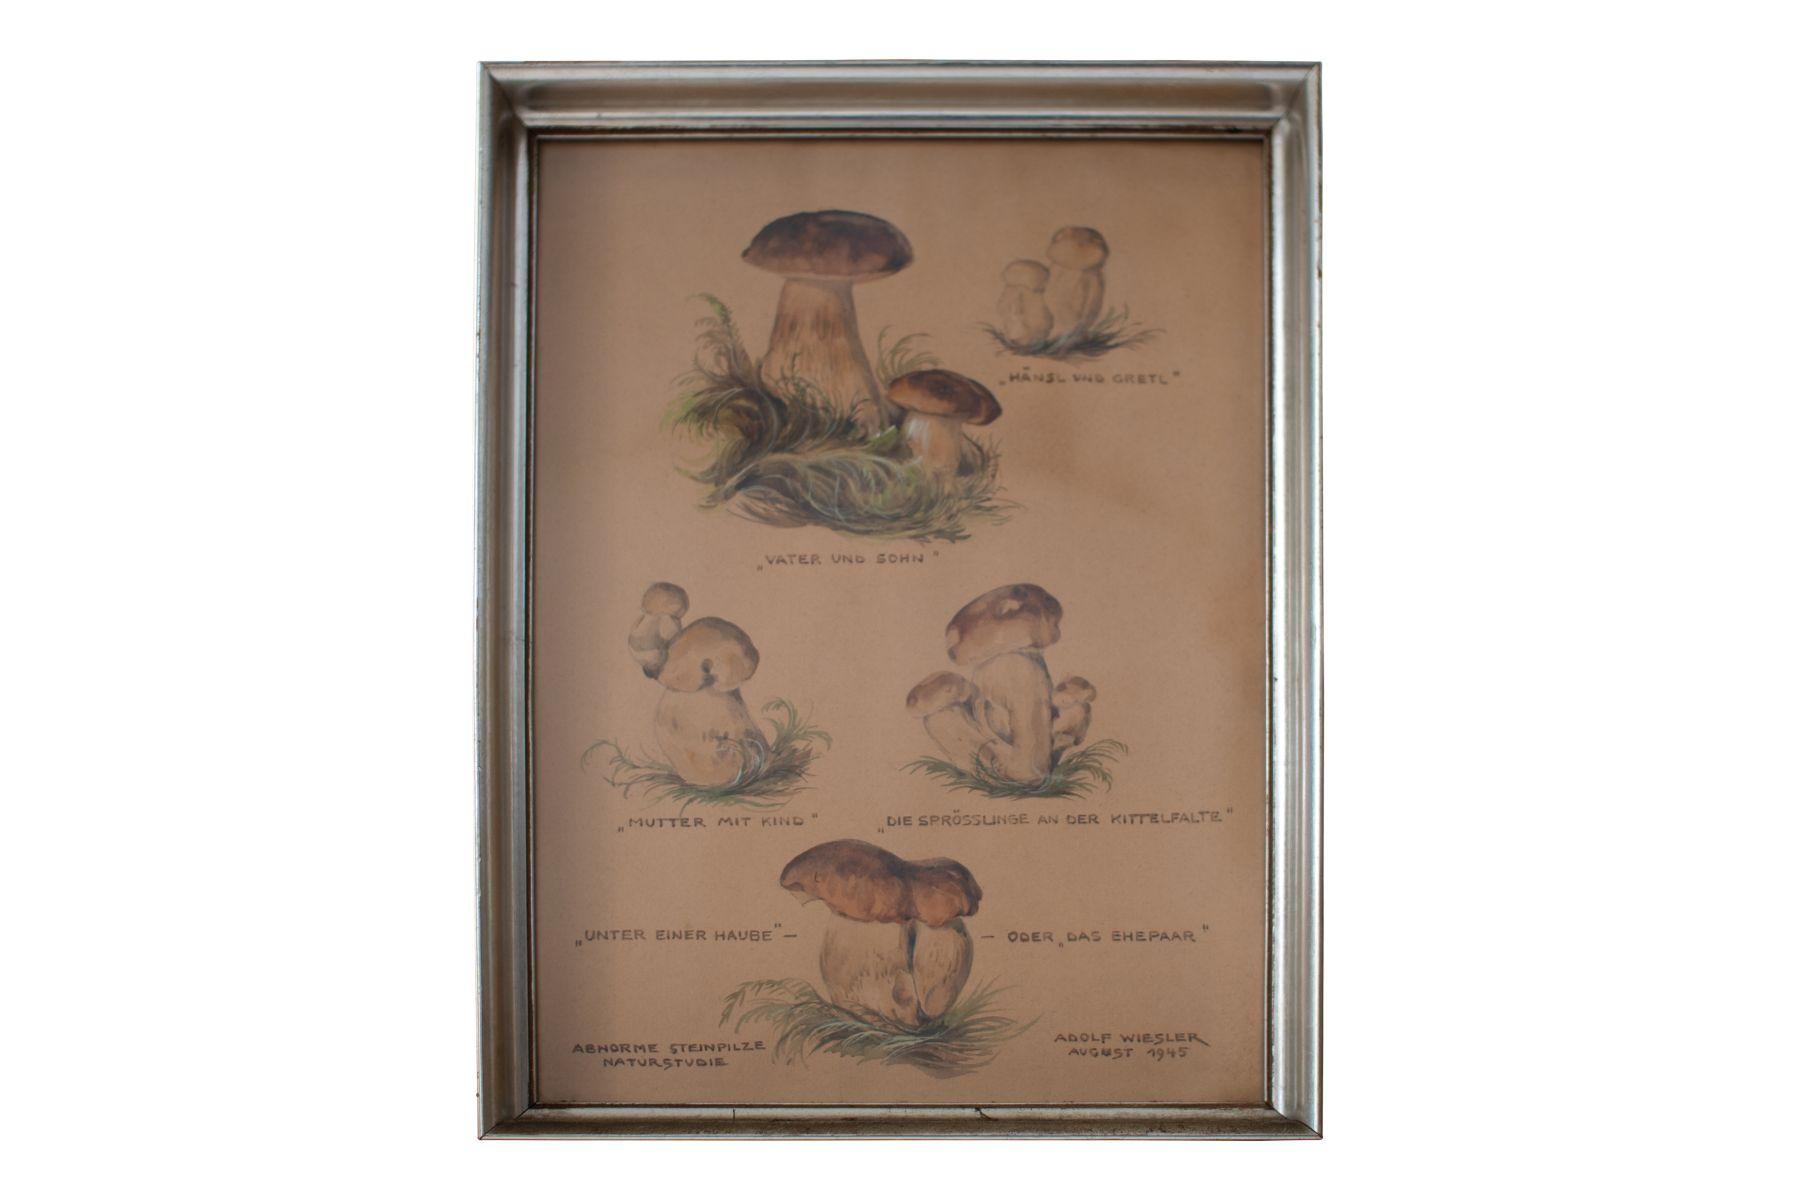 "#94 Abnormal porcini mushrooms | Adolf Wiesler (1878-1958) ""Abnorme Steinpilze"" Image"